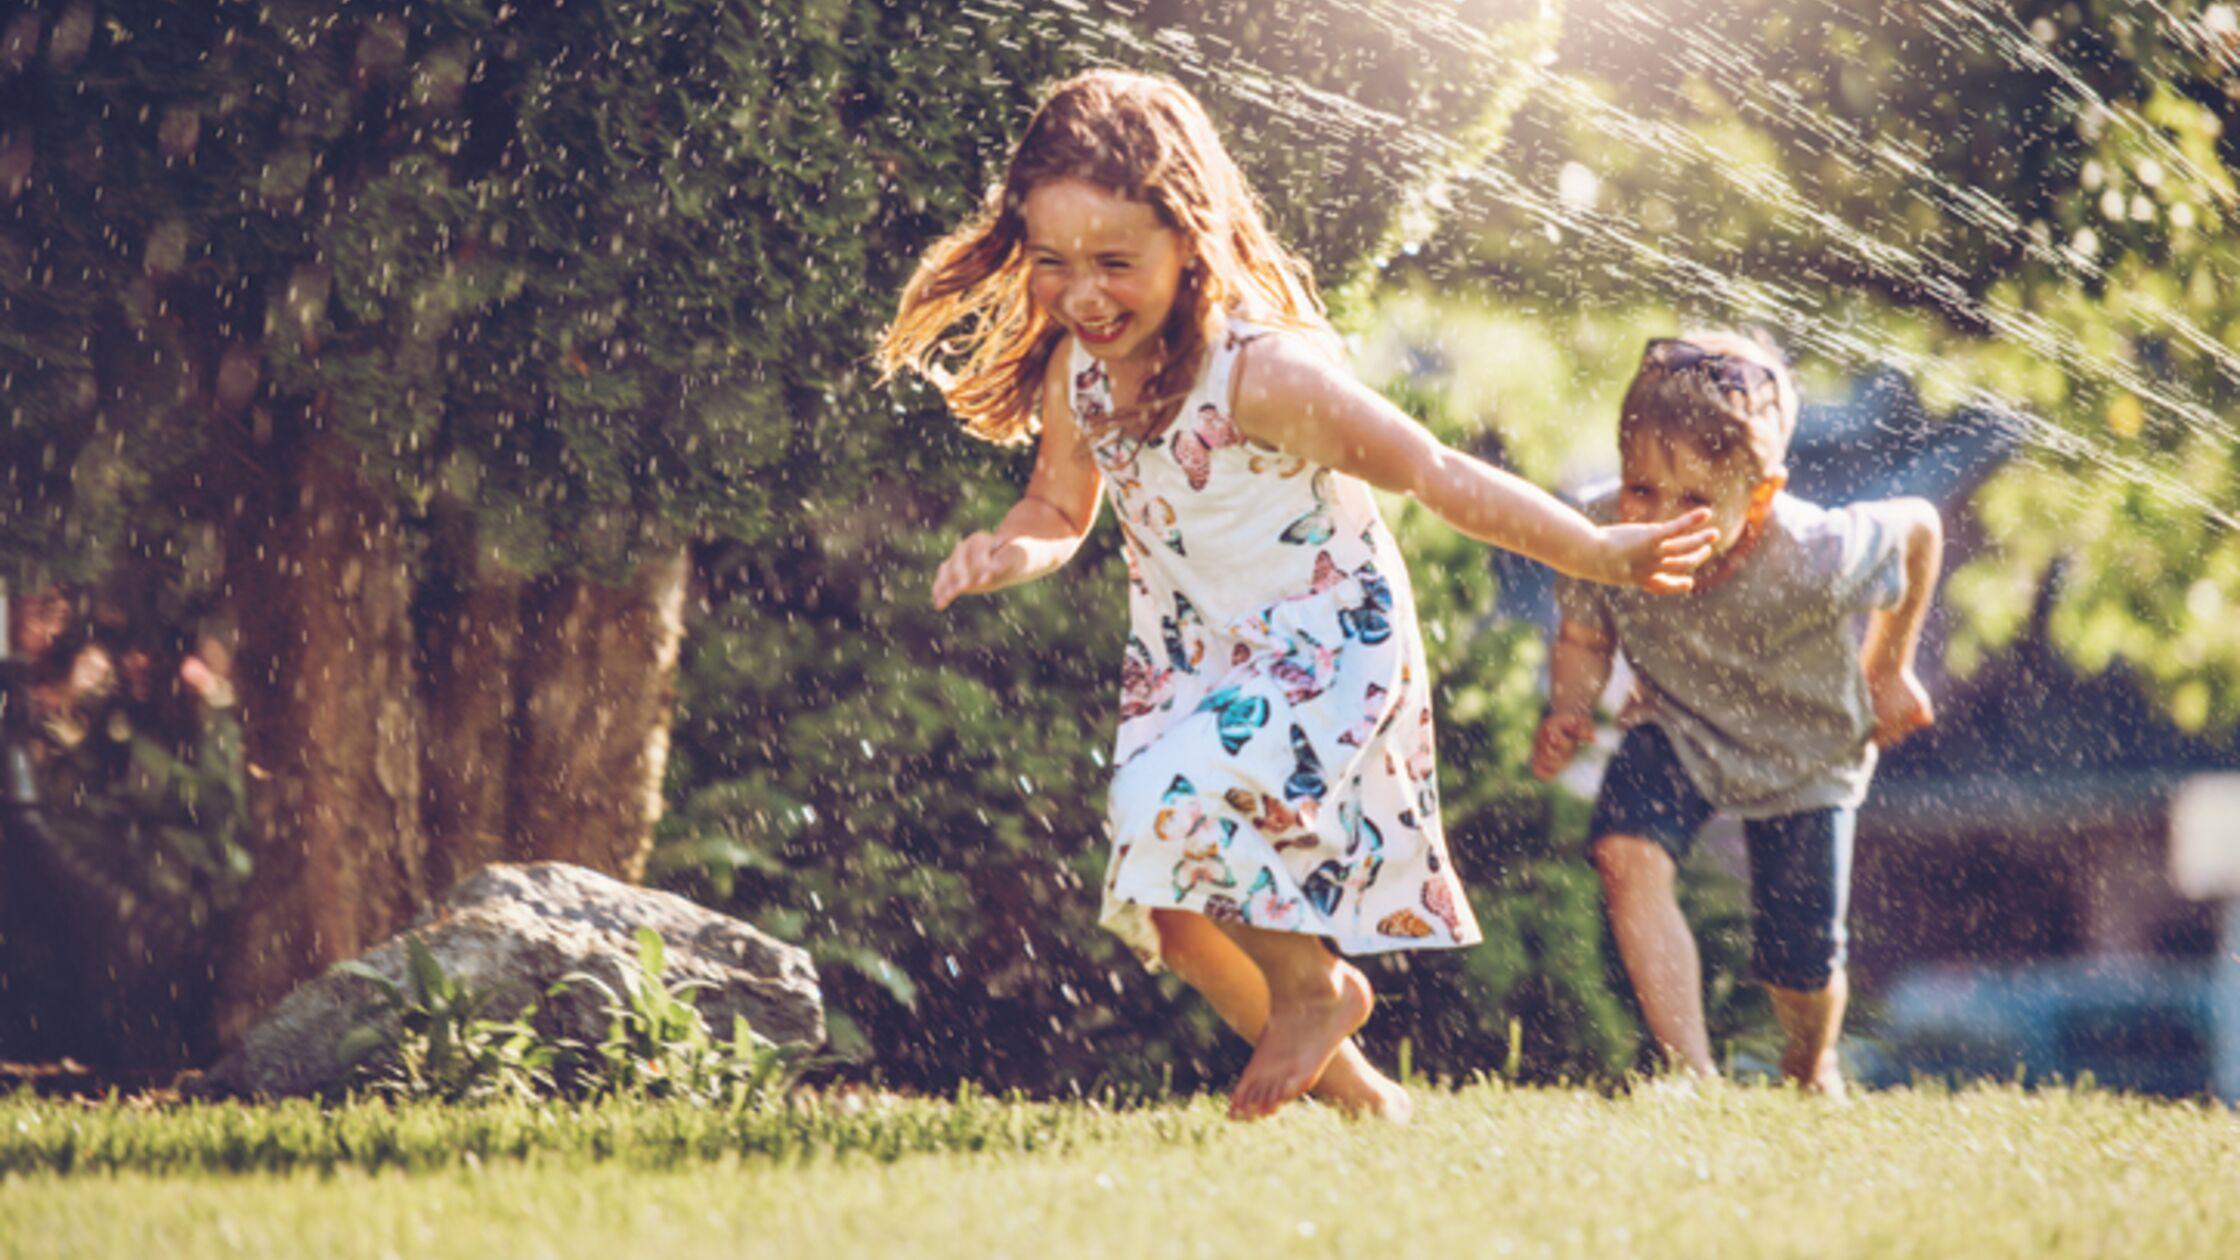 Gewohnheitsrecht Mieter Gartennutzung